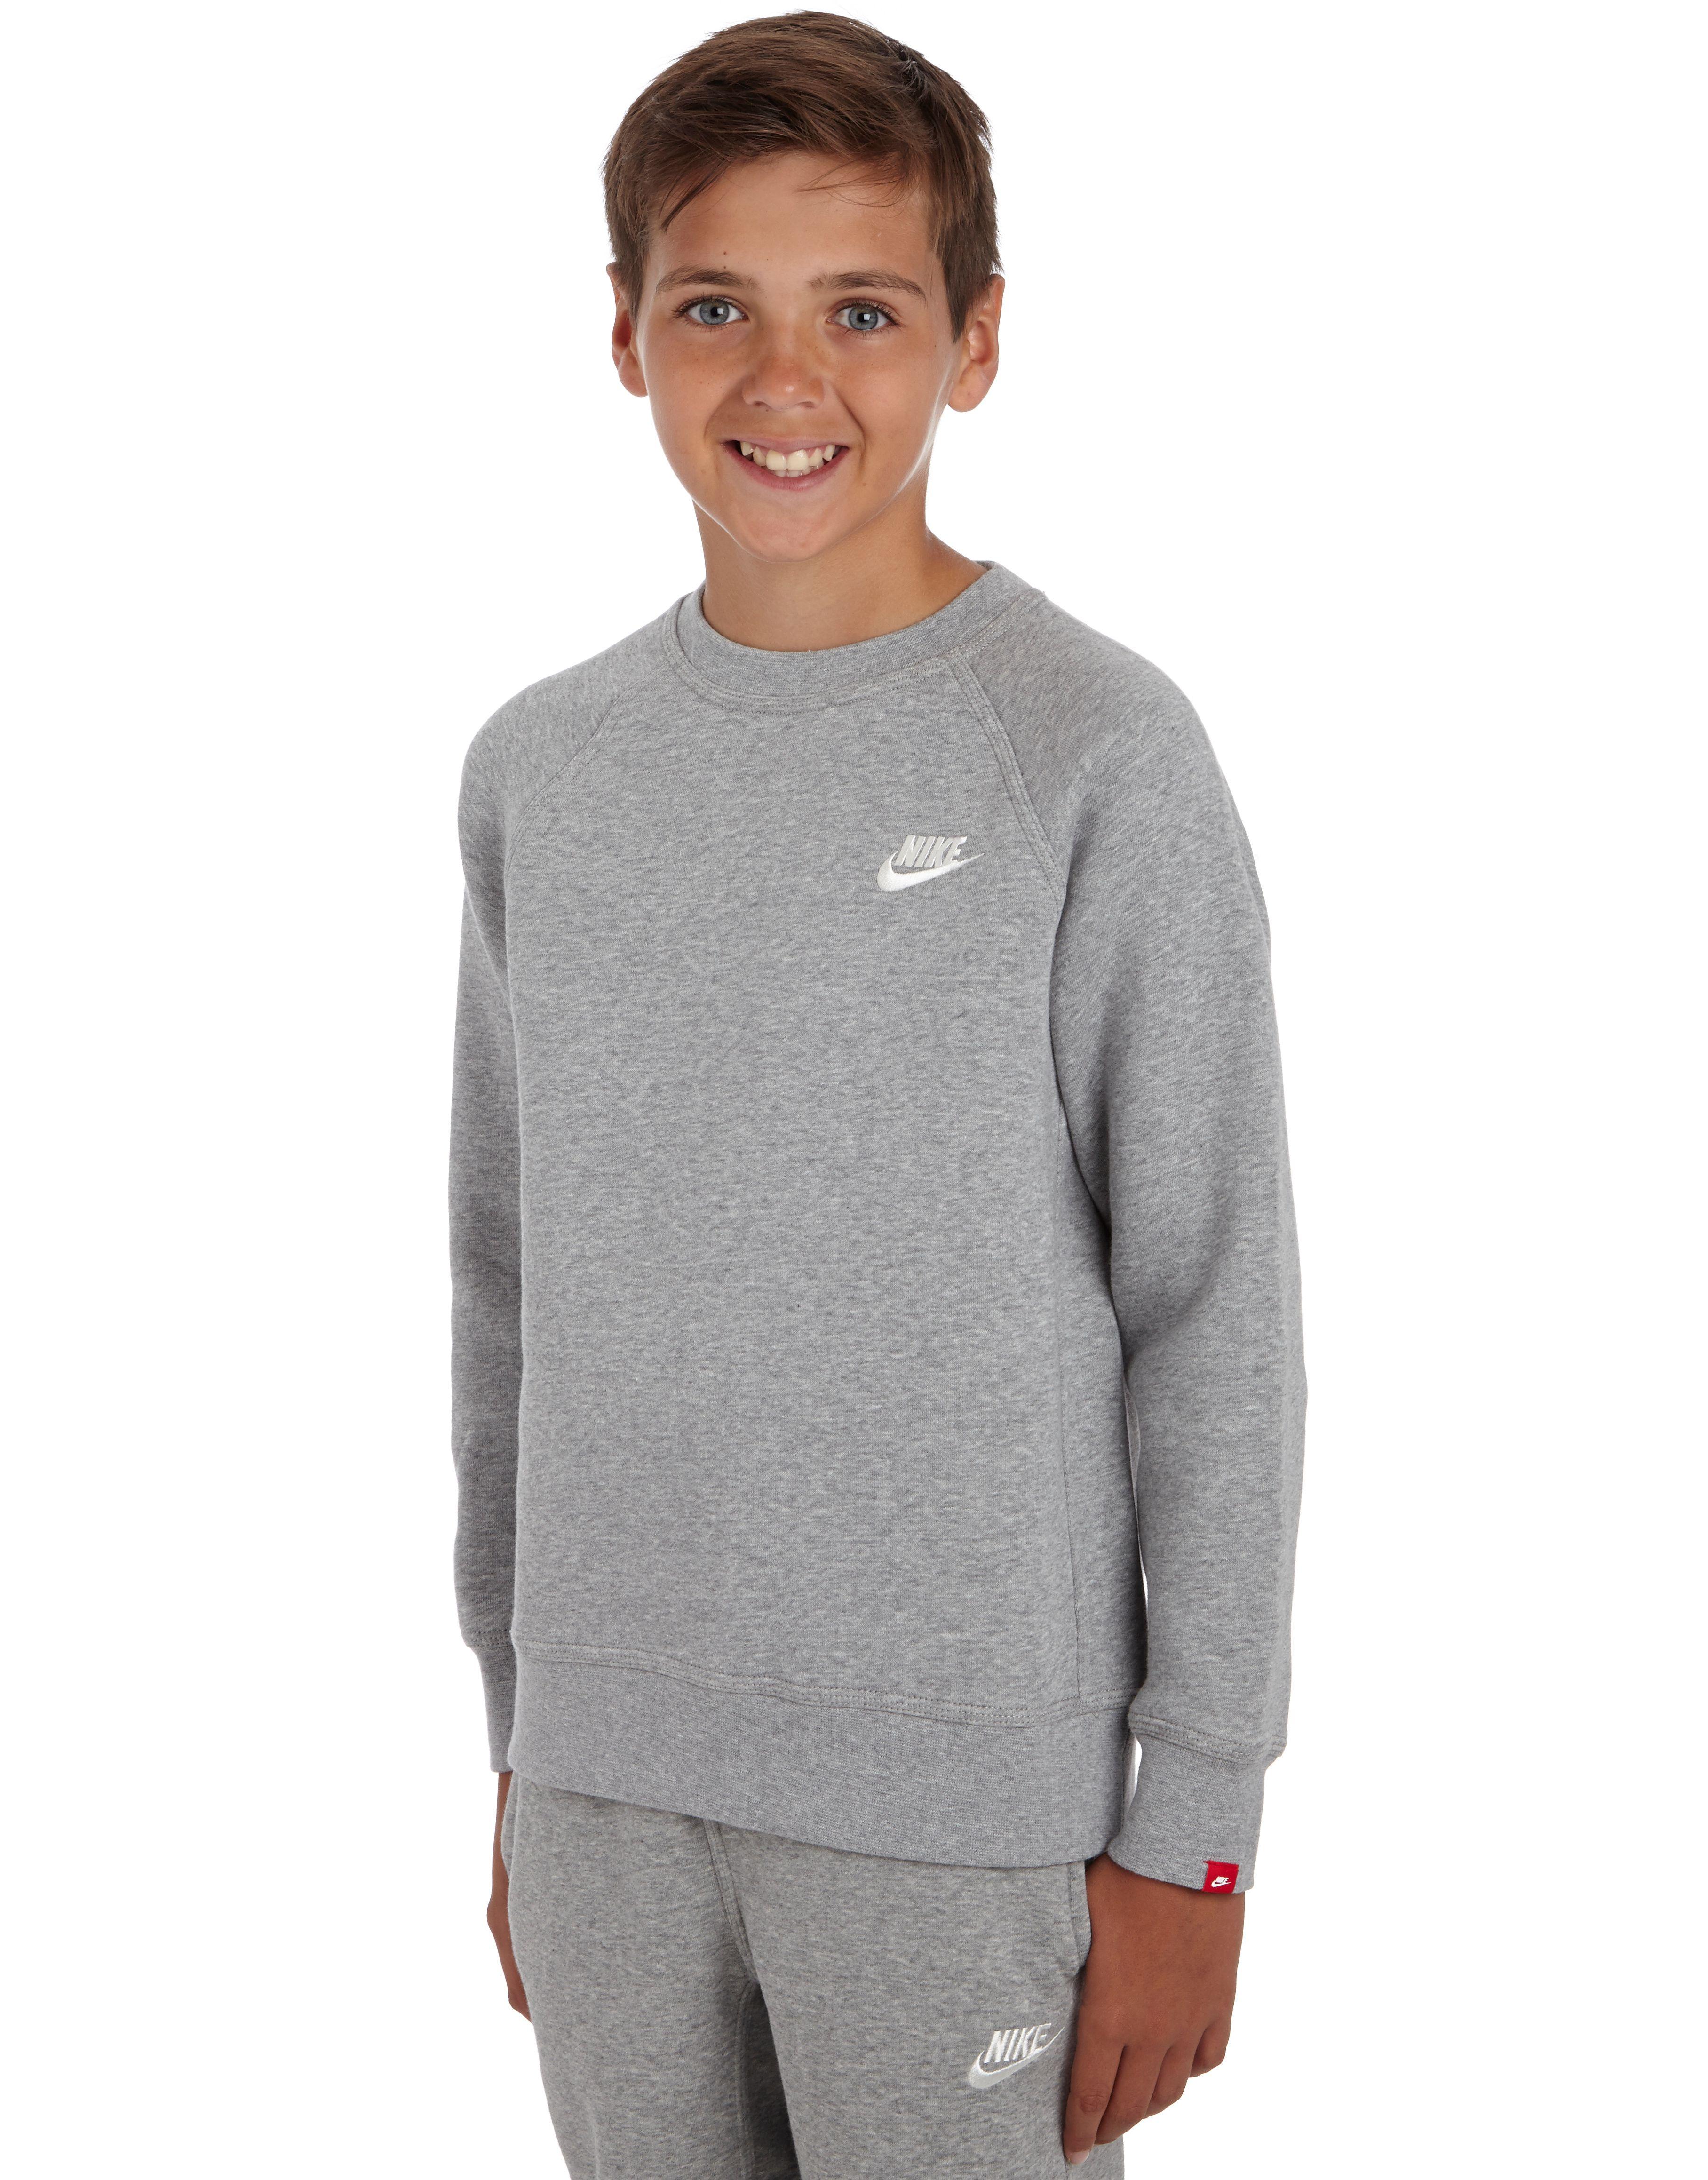 Nike Franchise Crew Sweatshirt Junior